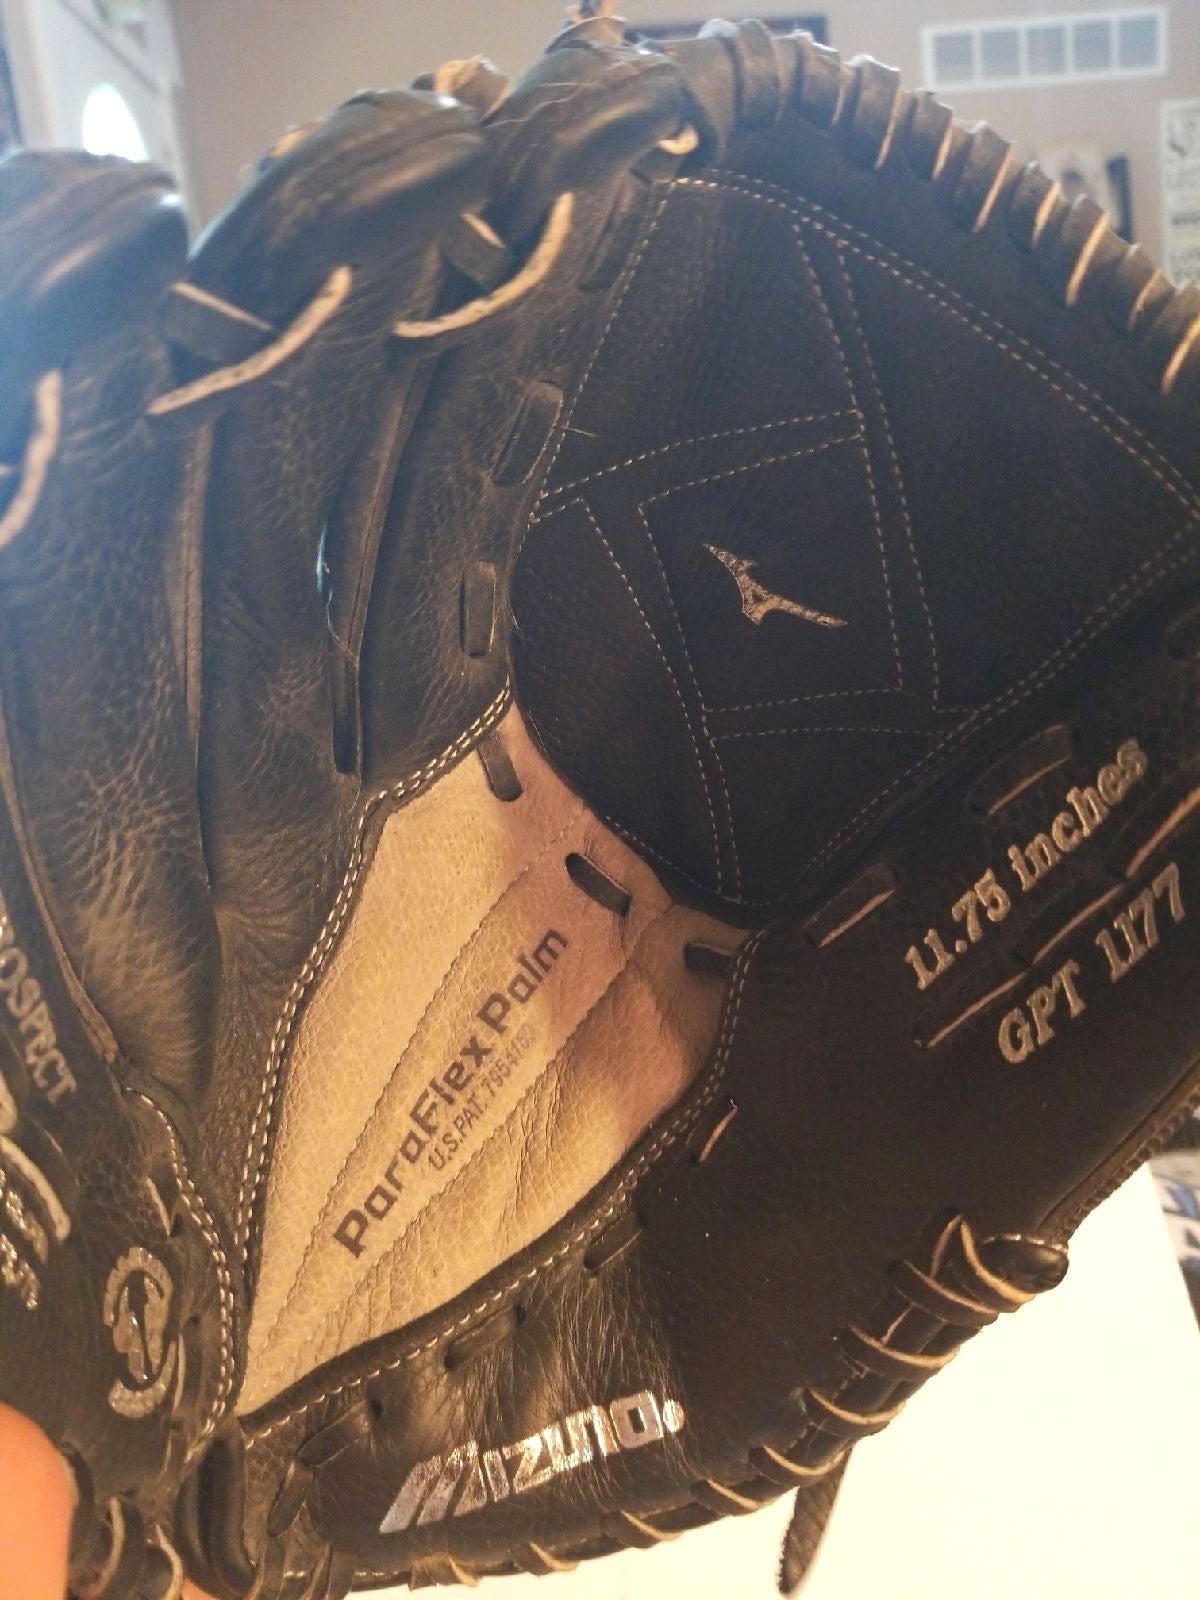 Mizuno softball glove, Lefthand throw